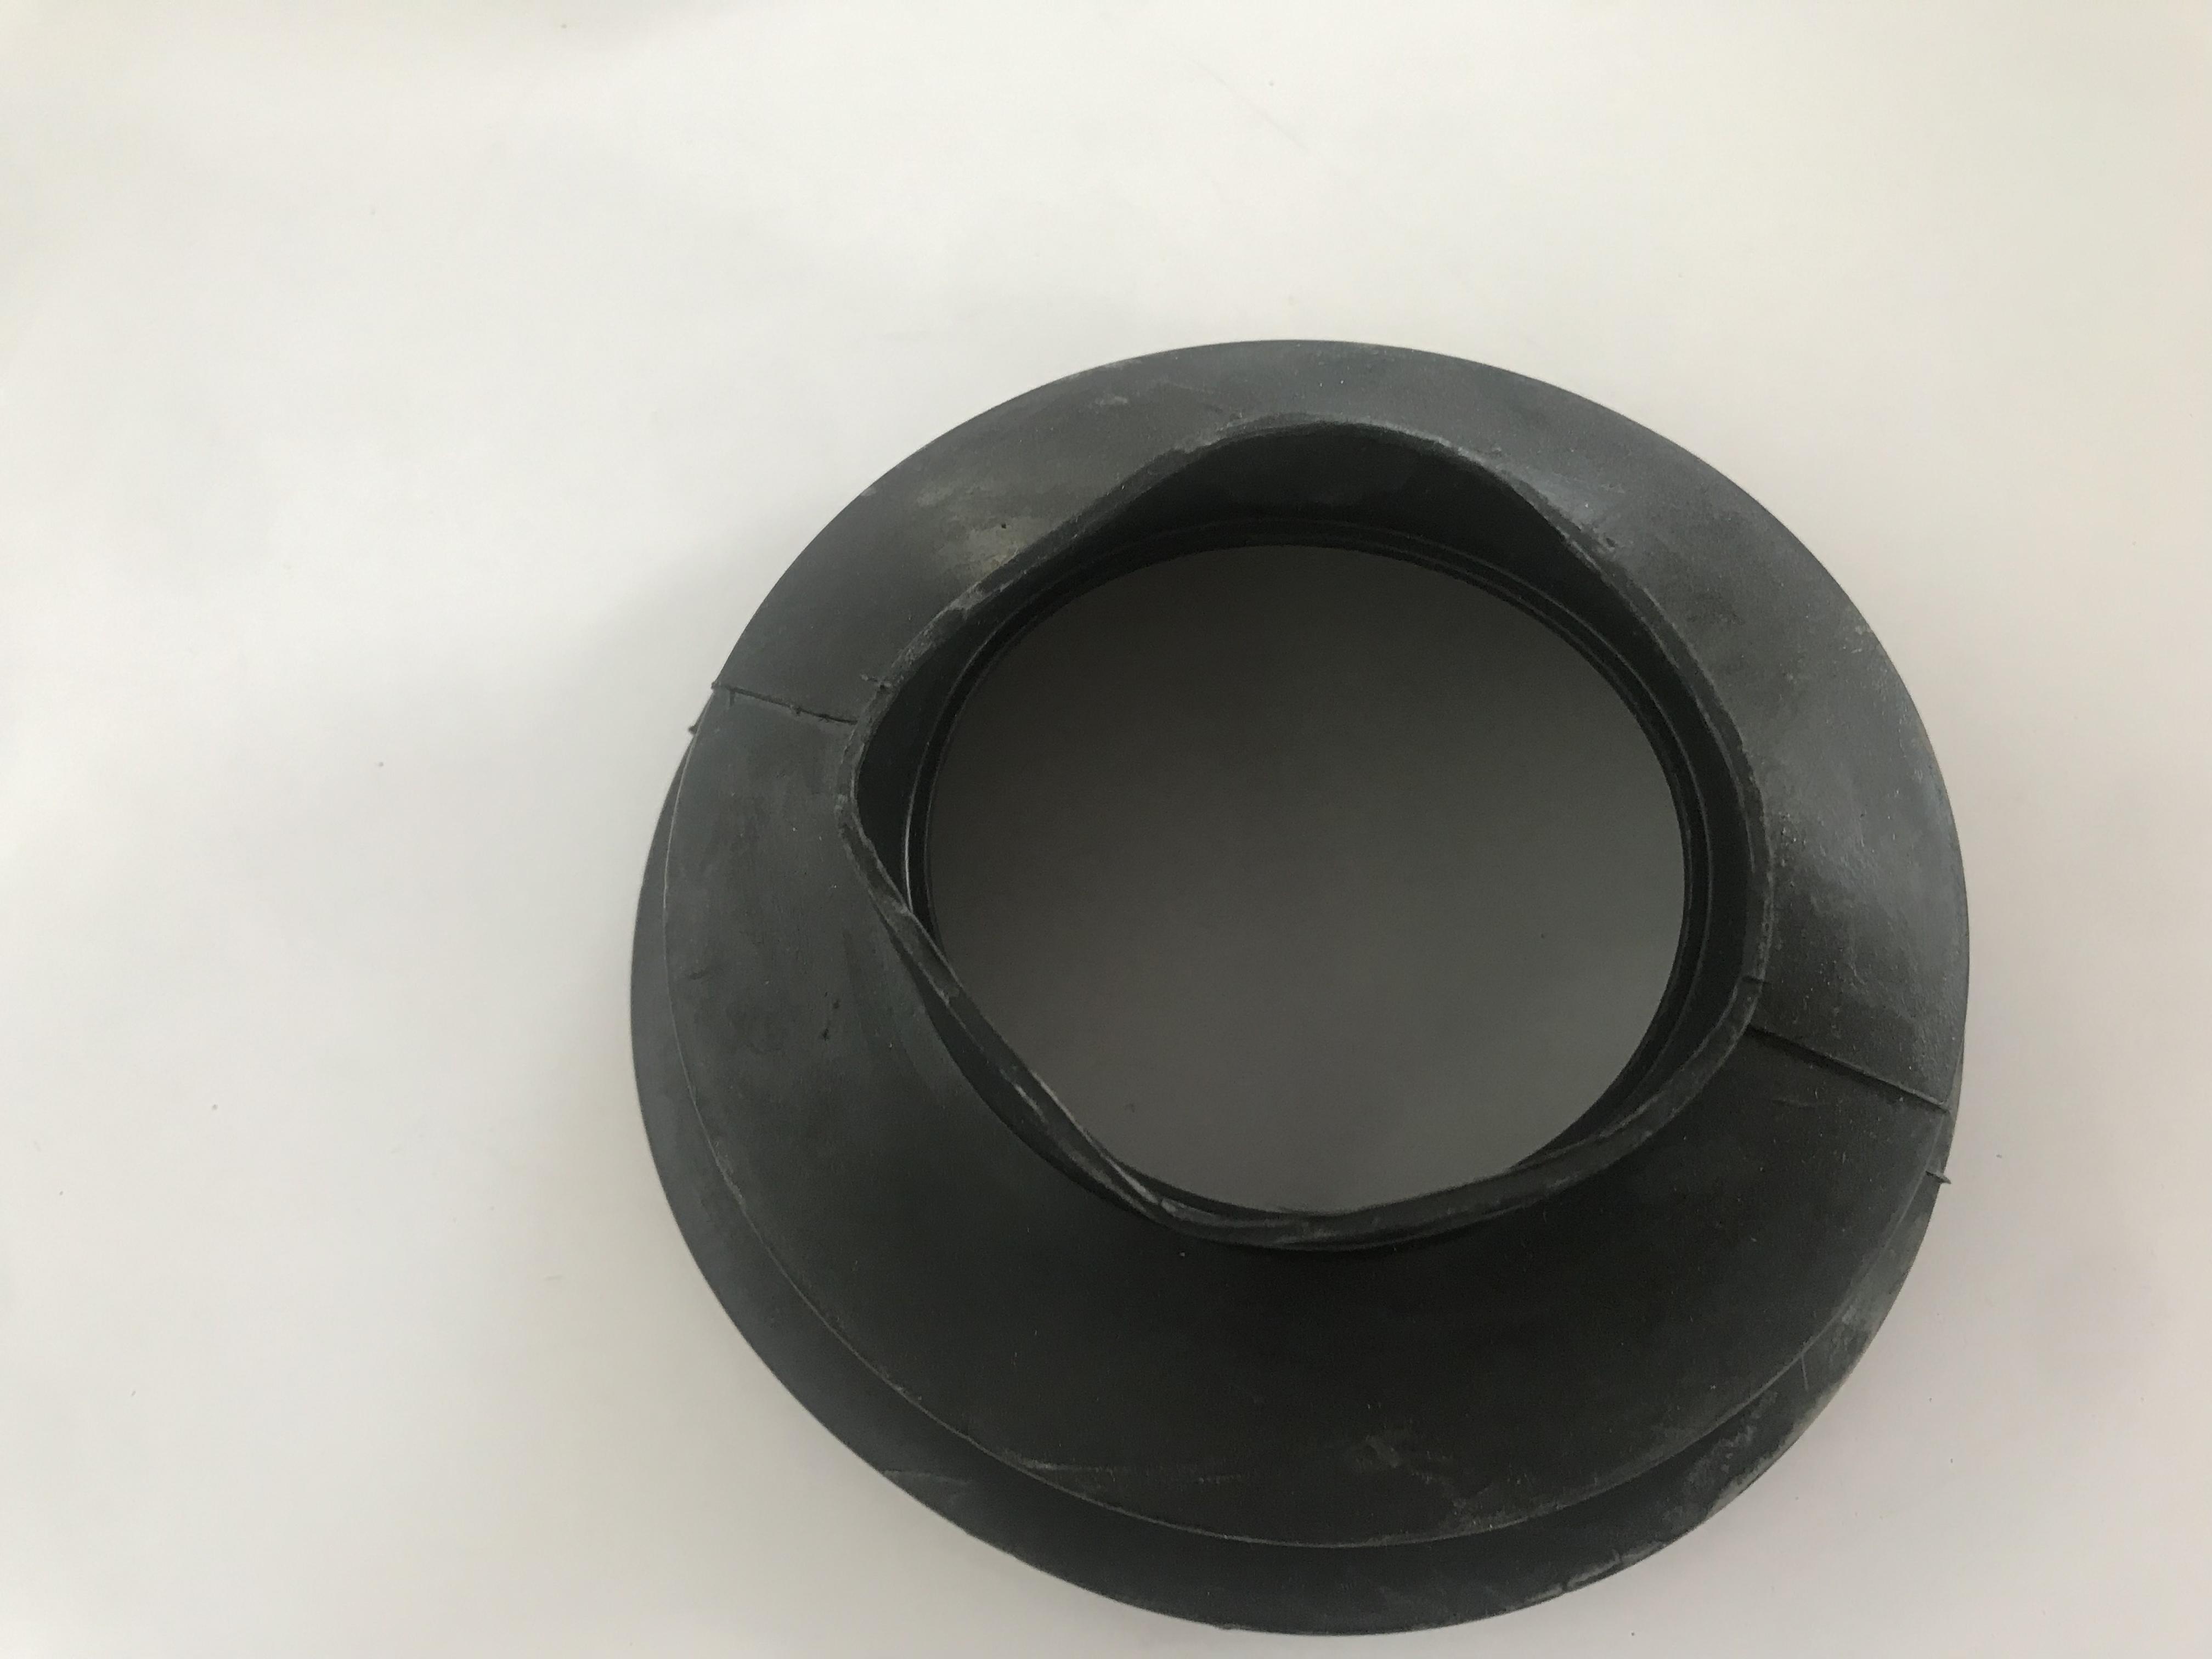 155mm*65mm waterproof rubber grommet